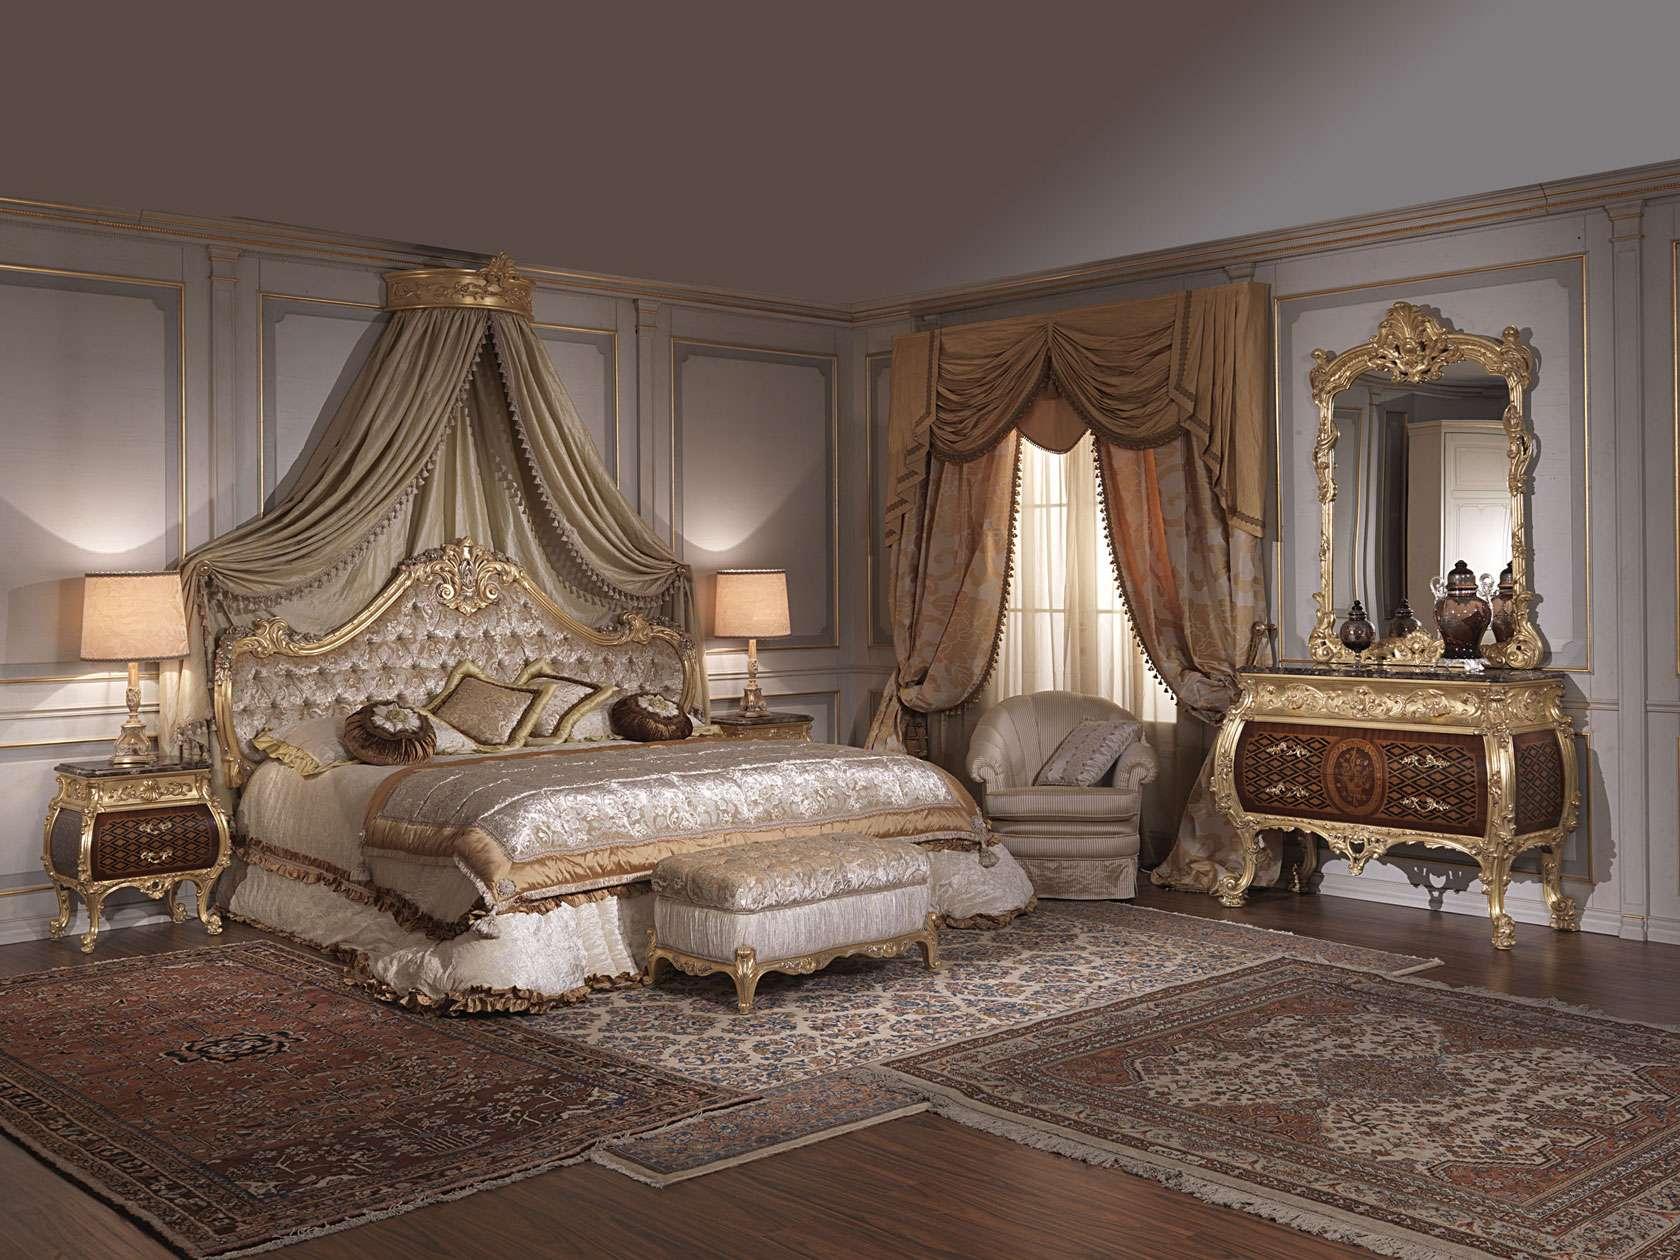 Classic Italian Bedroom 18th Century And Louis XV